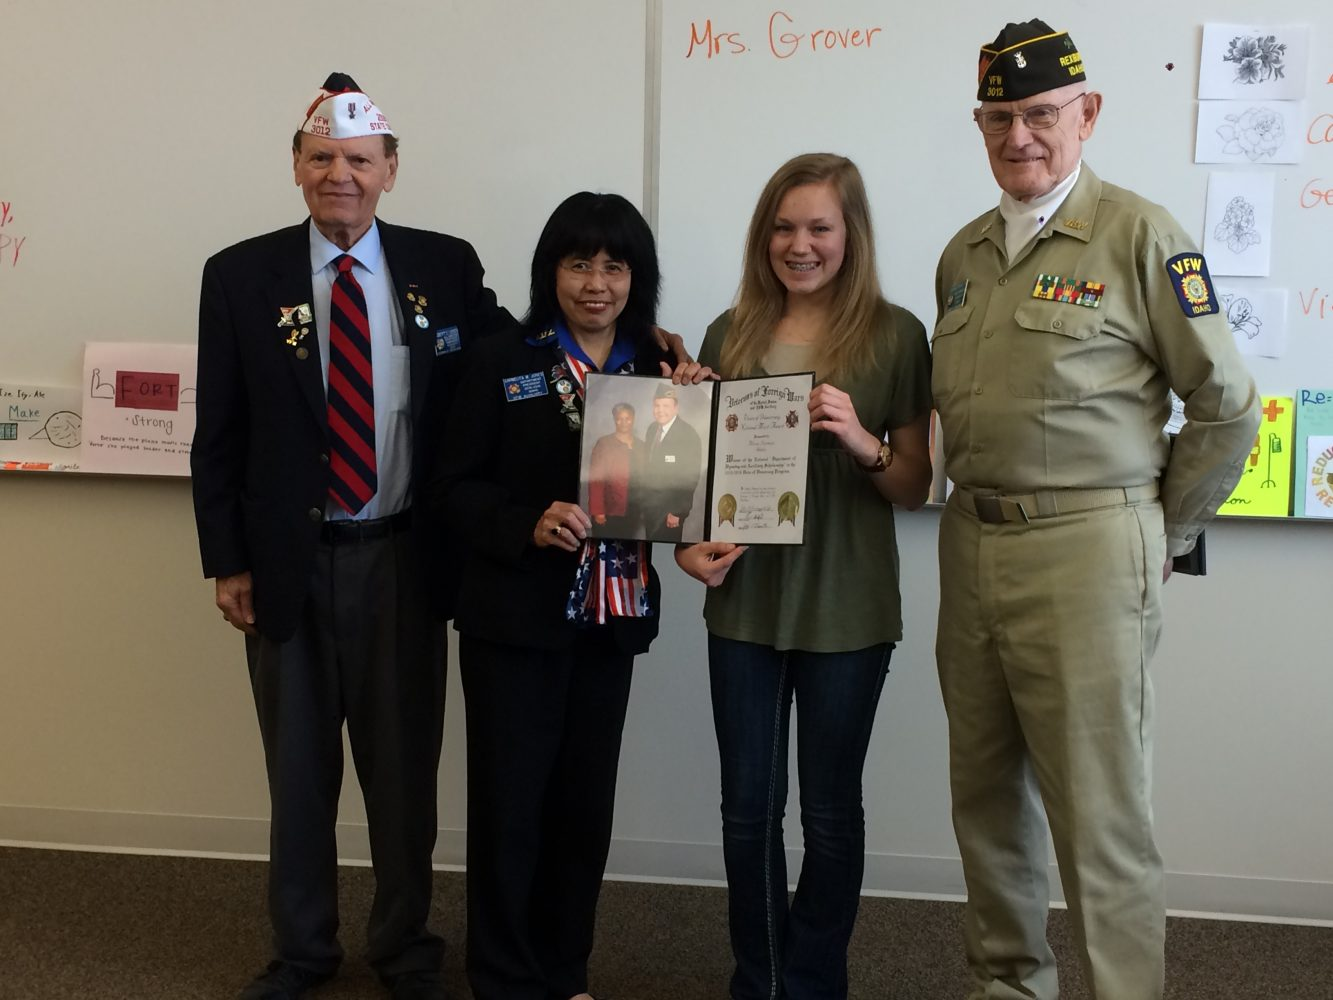 Robert+Jones%2C+Carmelita+Jones%2C+and+Richard+Pingry+from+the+Idaho+Veterans+of+Foreign+Wars+presents+an+award+to+sophomore+Alissa+Dorman.